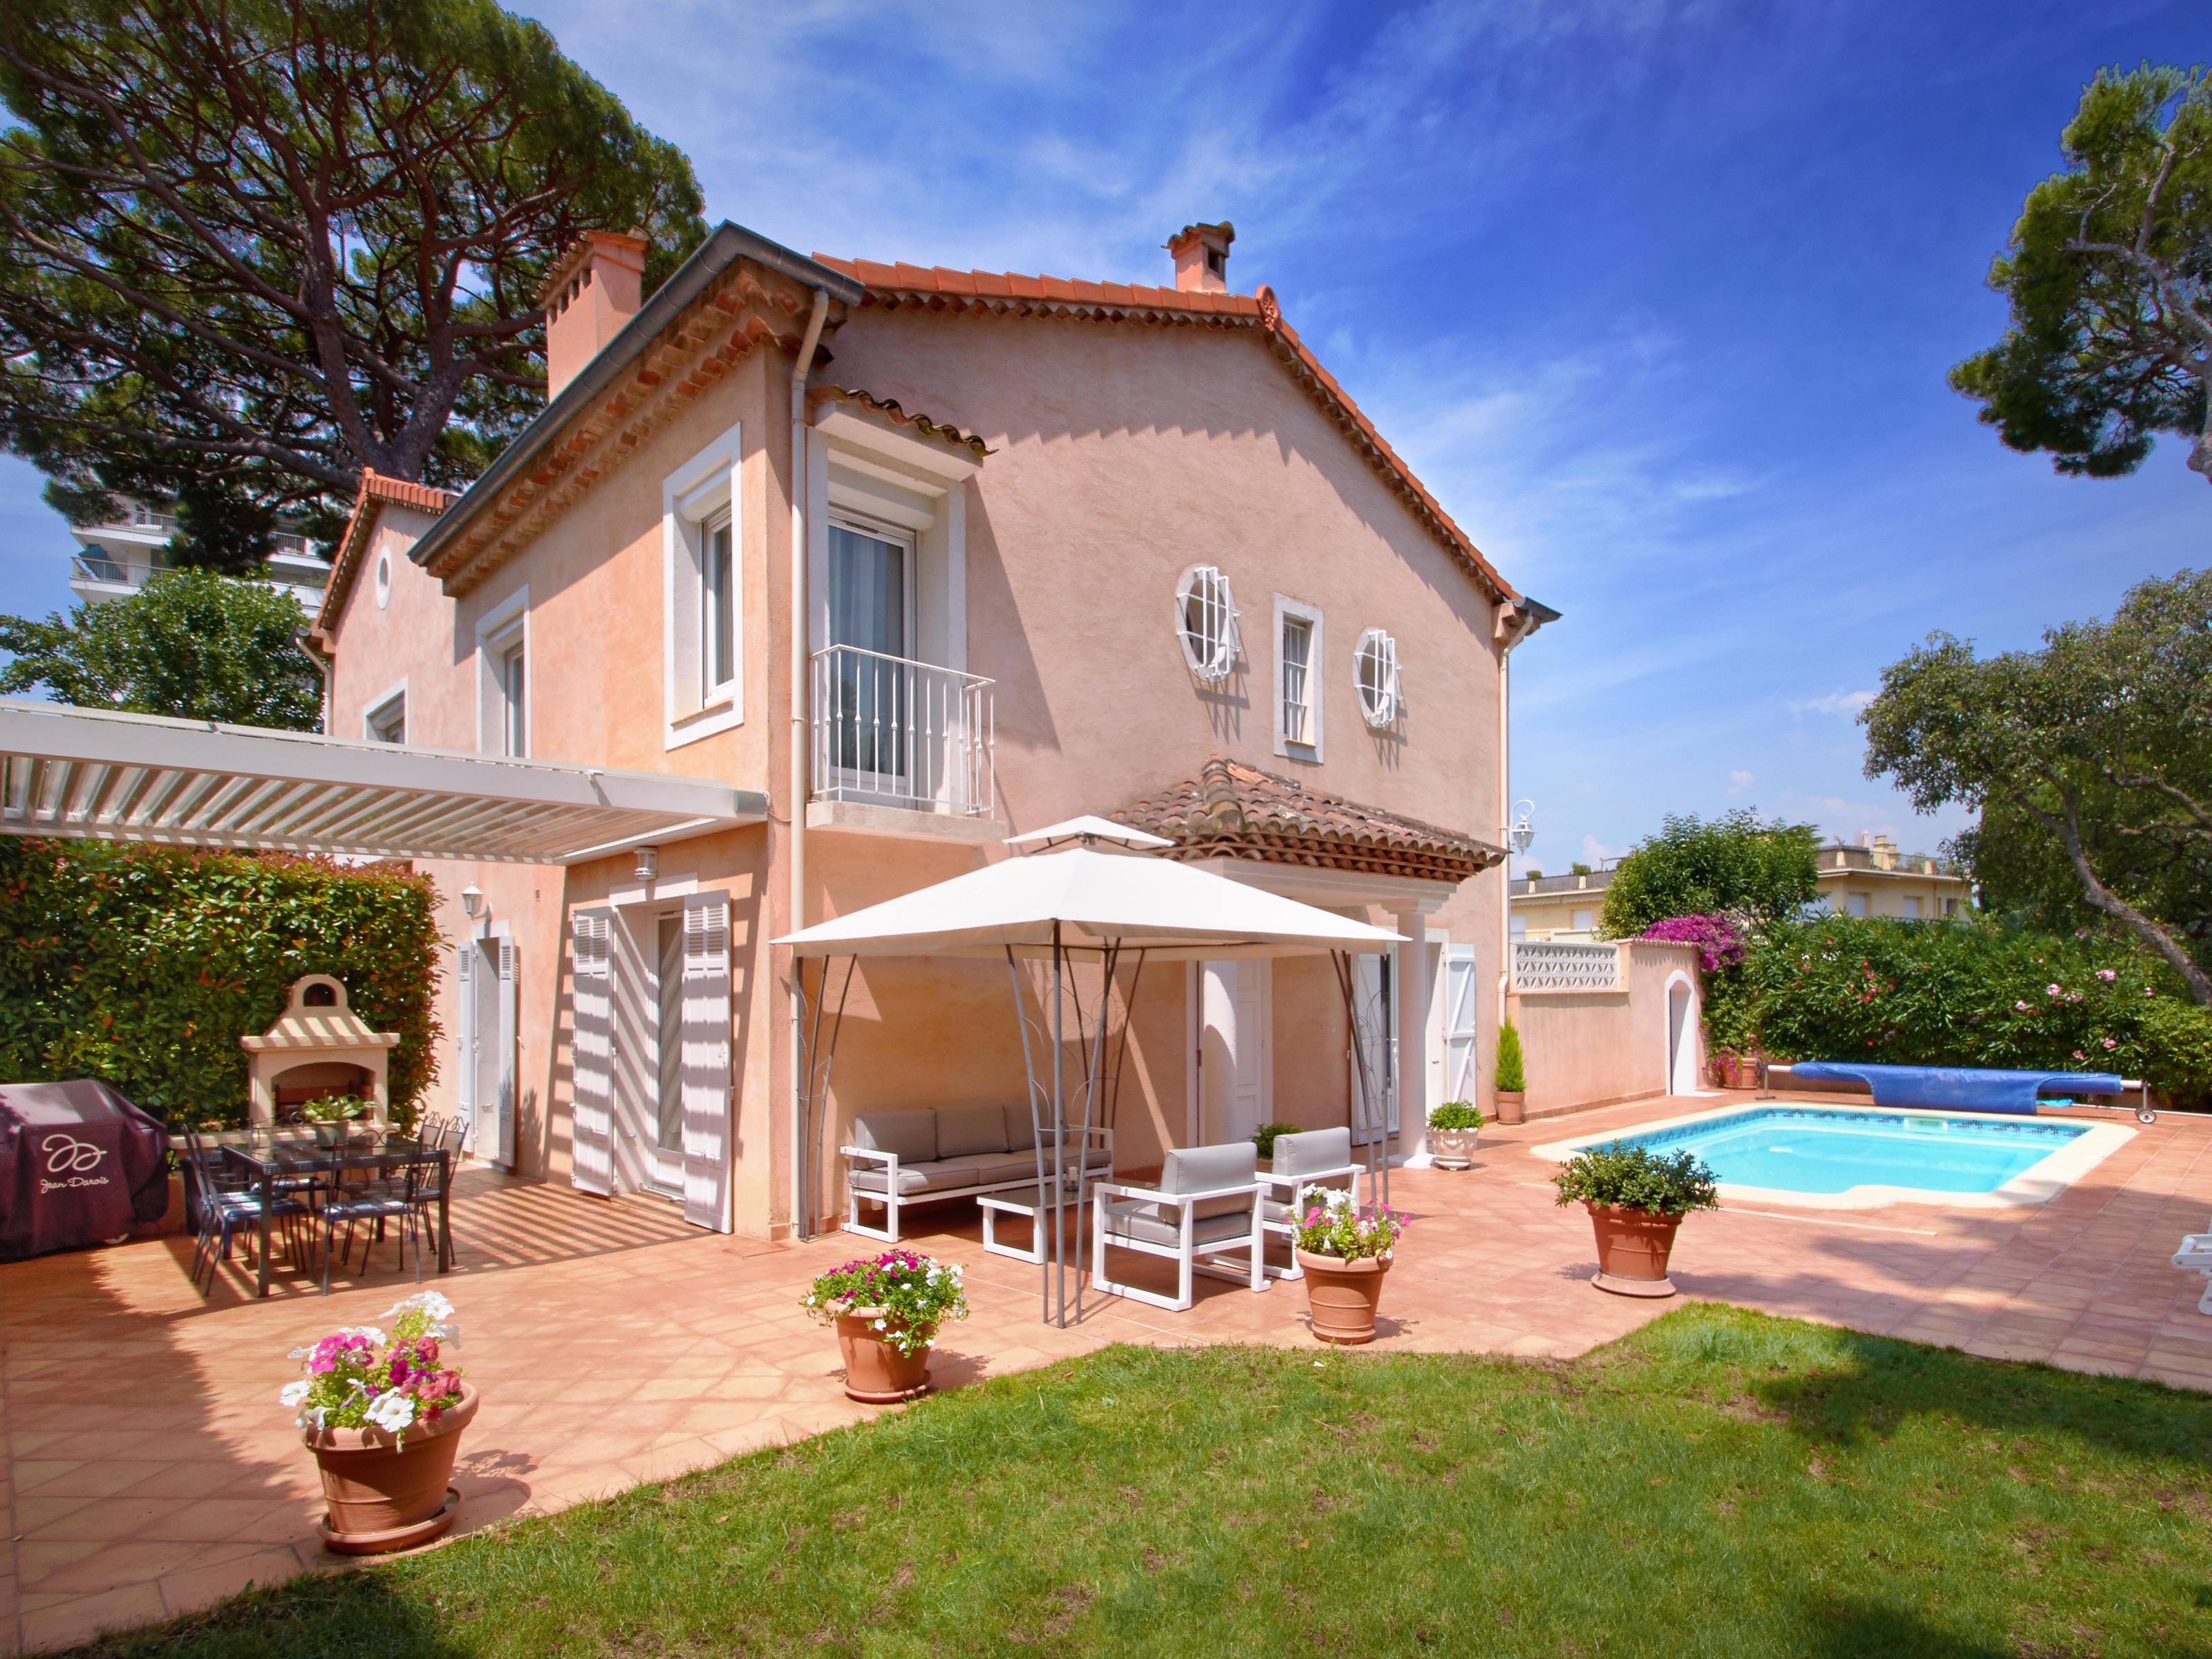 Tek Ailelik Ev için Satış at Magnificent villa immaculately refurbished with open view Cannes Cannes, Provence-Alpes-Cote D'Azur 06400 Fransa